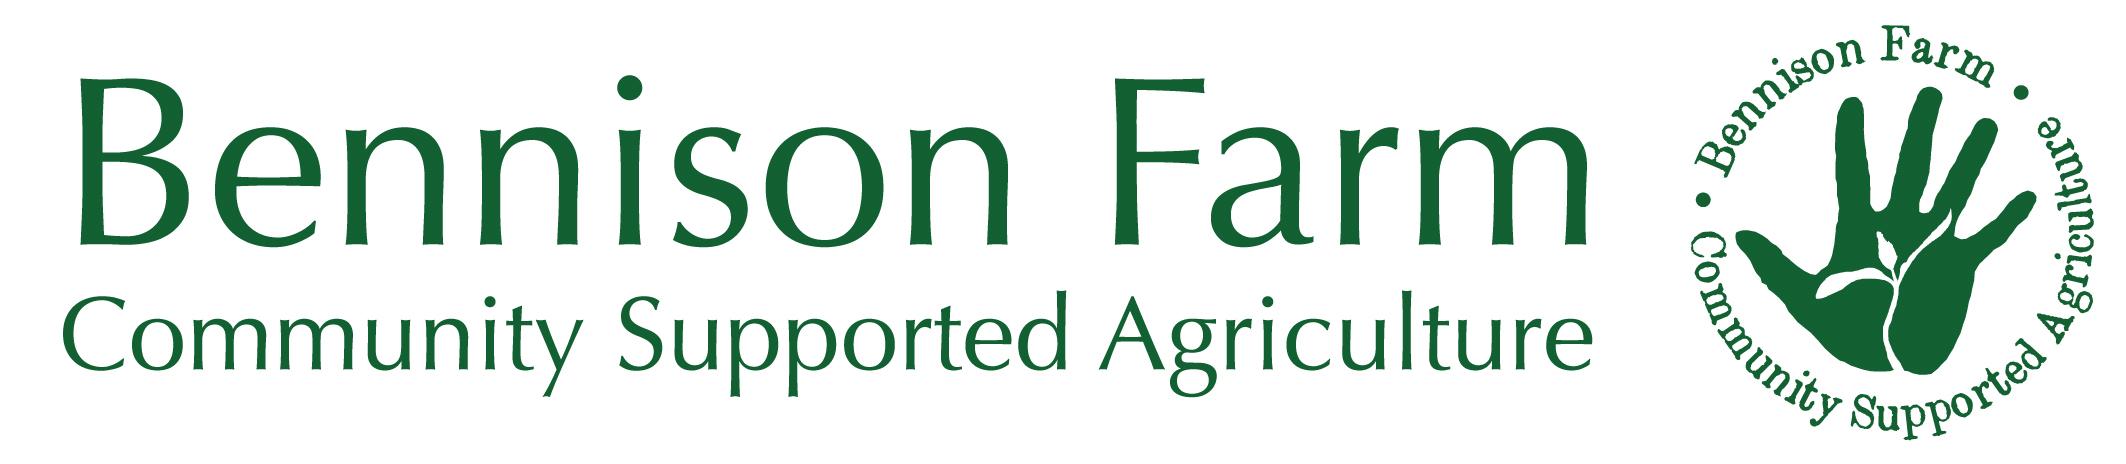 Bennison Farm